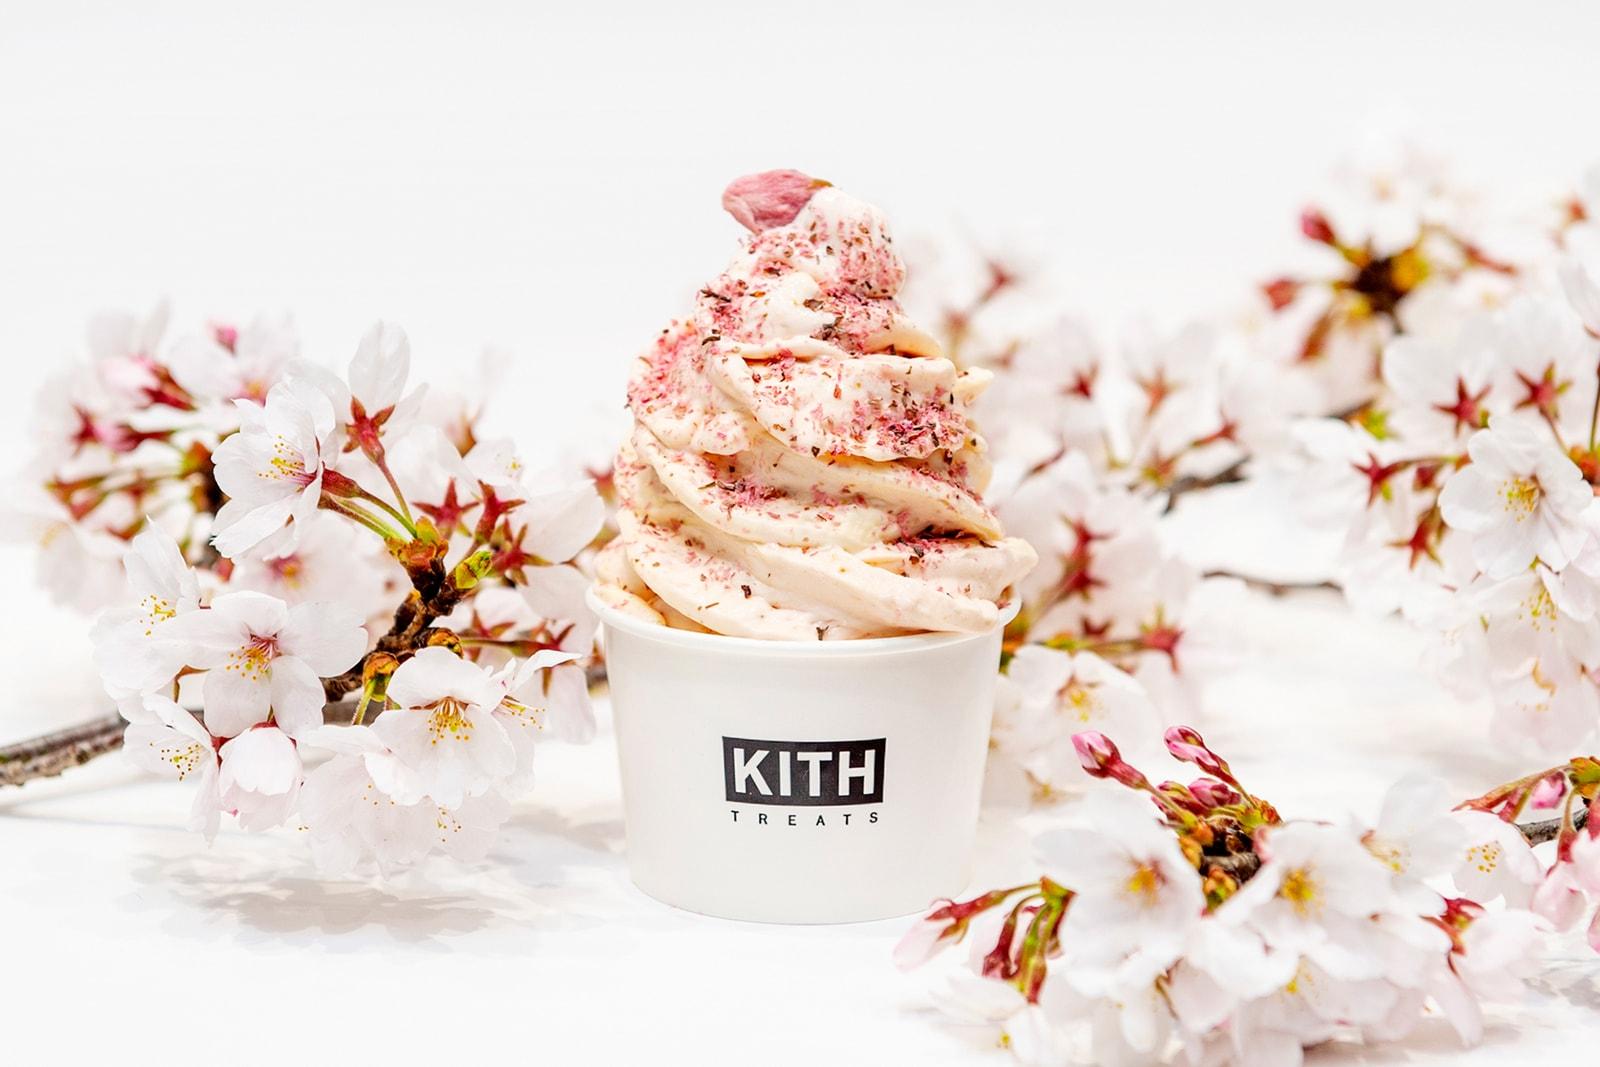 KITH TREATS TOKYO キス トリーツ トウキョウ 東京店舗限定 HANAMI Capsule 花見 カプセル 桜 Ronnie Fieg ロニー・ファイグ